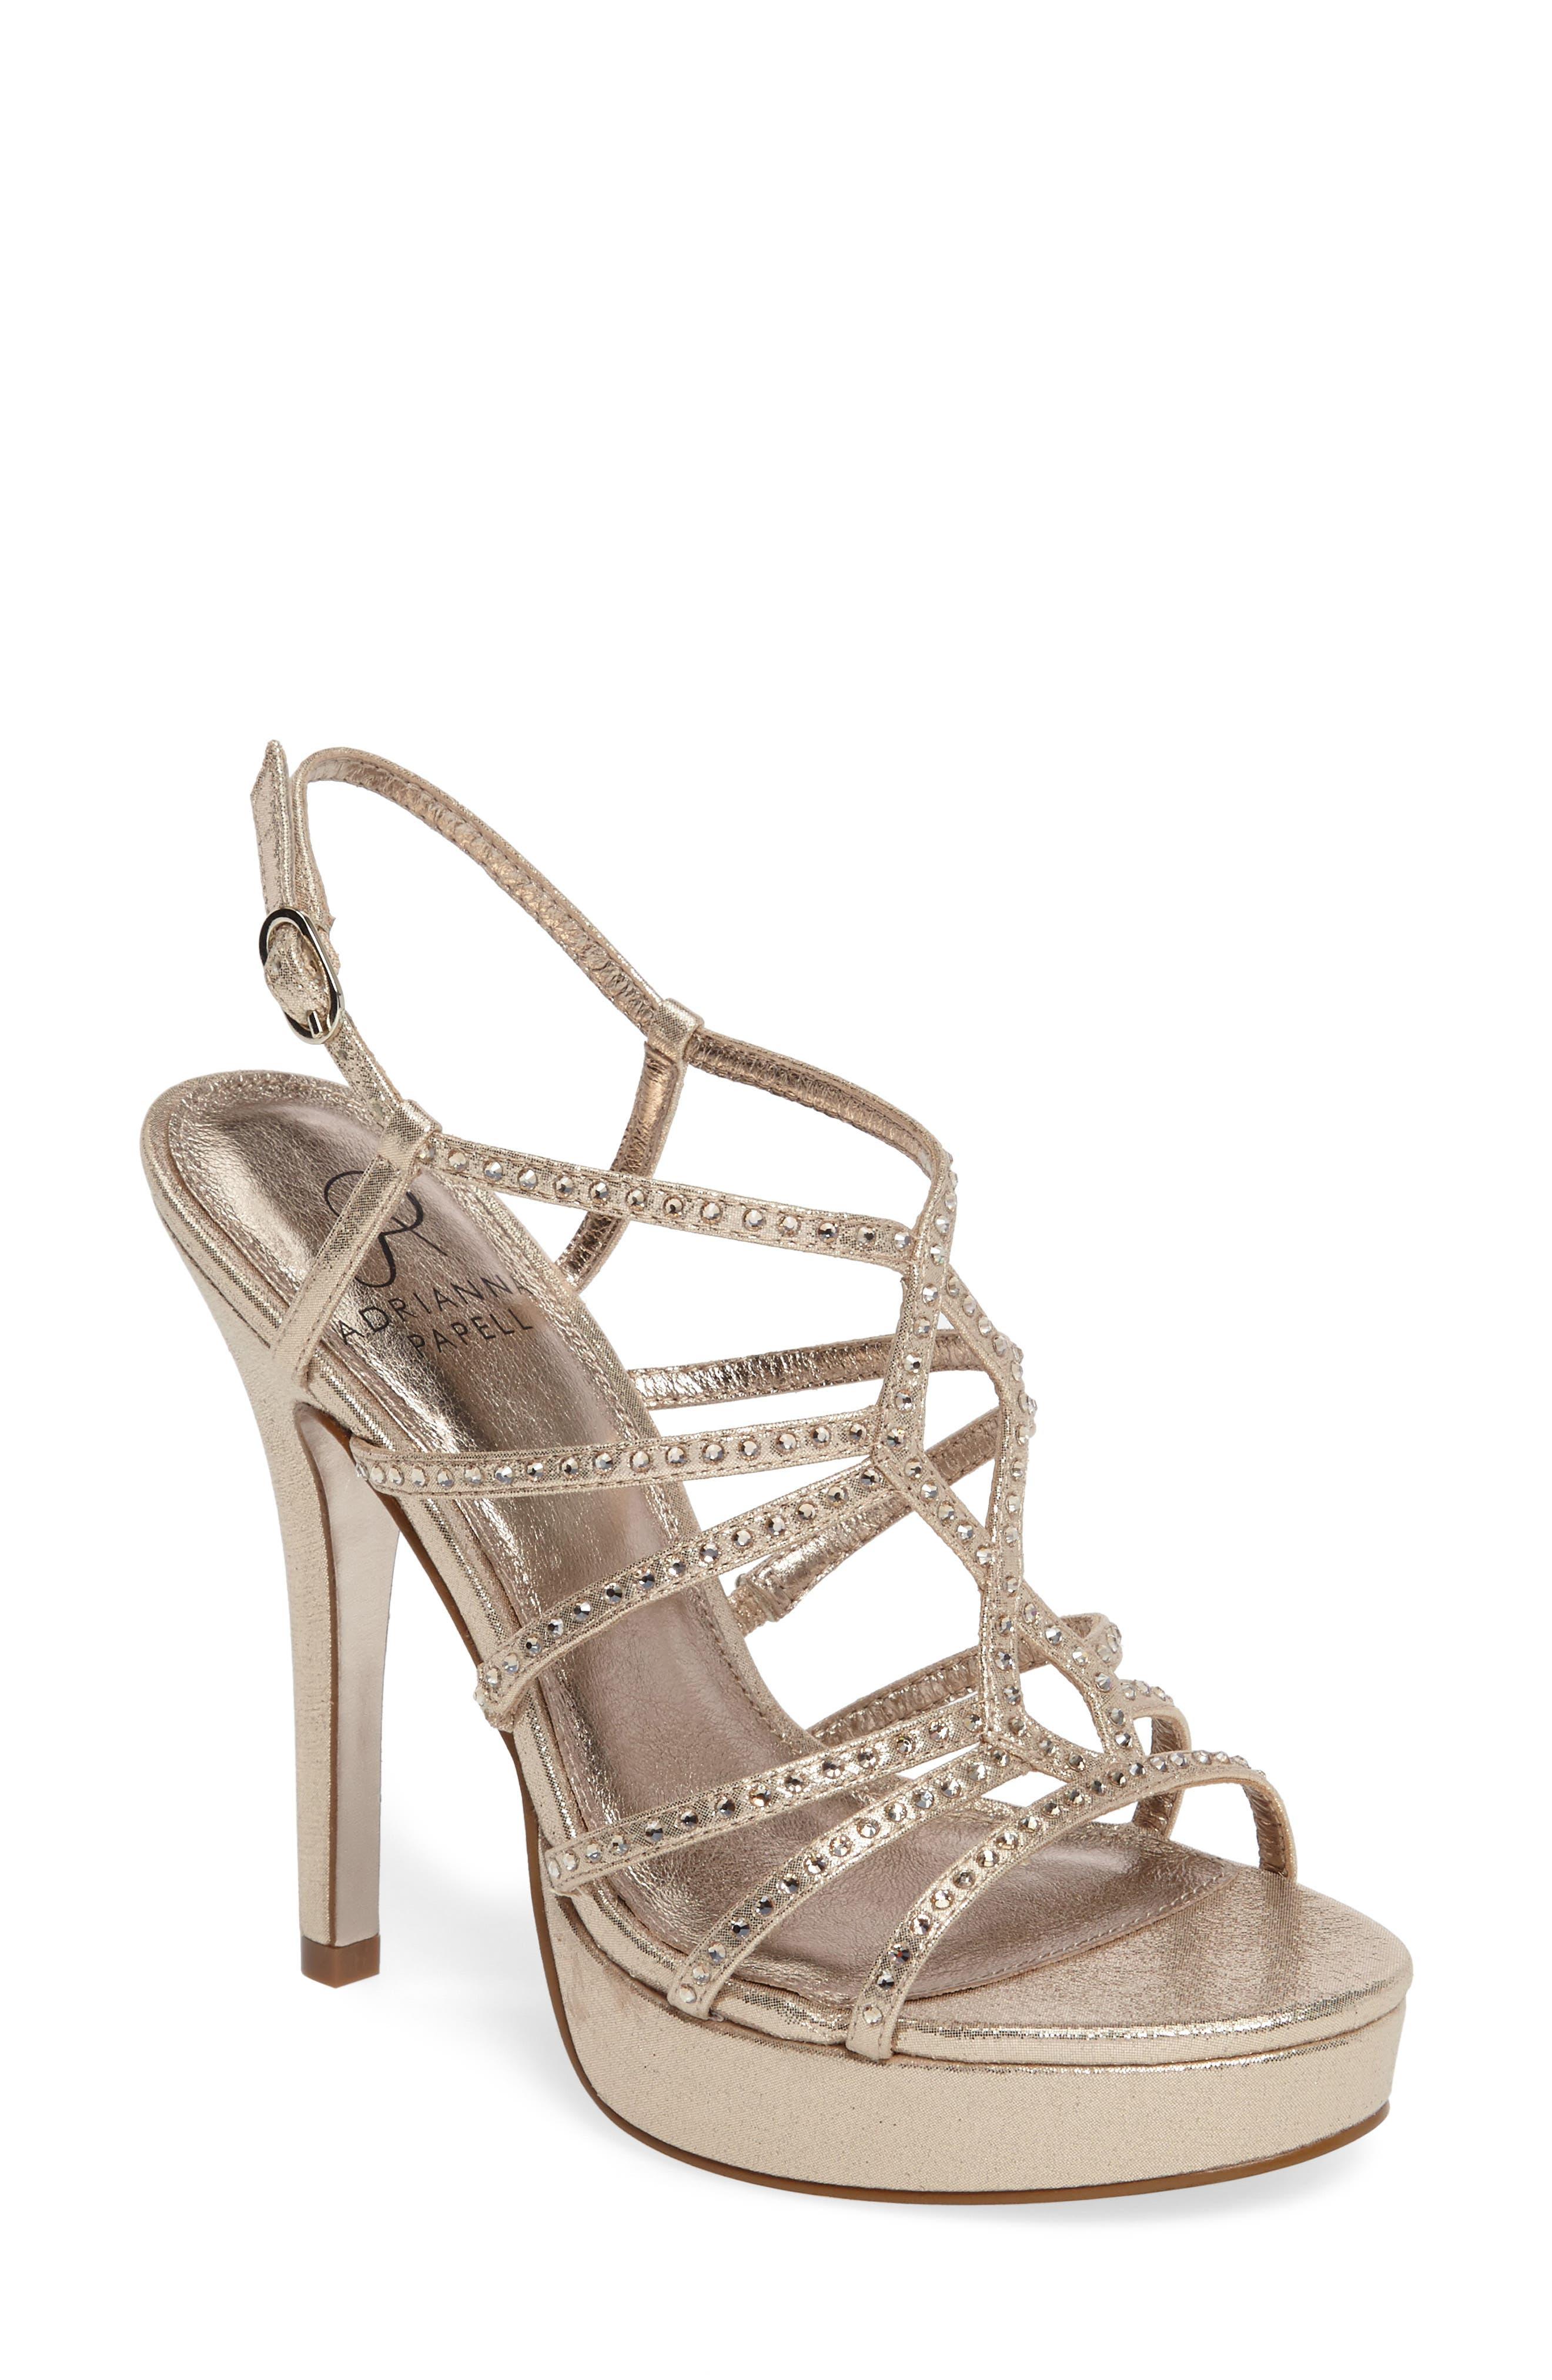 Miranda Embellished Platform Sandal,                             Main thumbnail 1, color,                             Gold Metallic Fabric